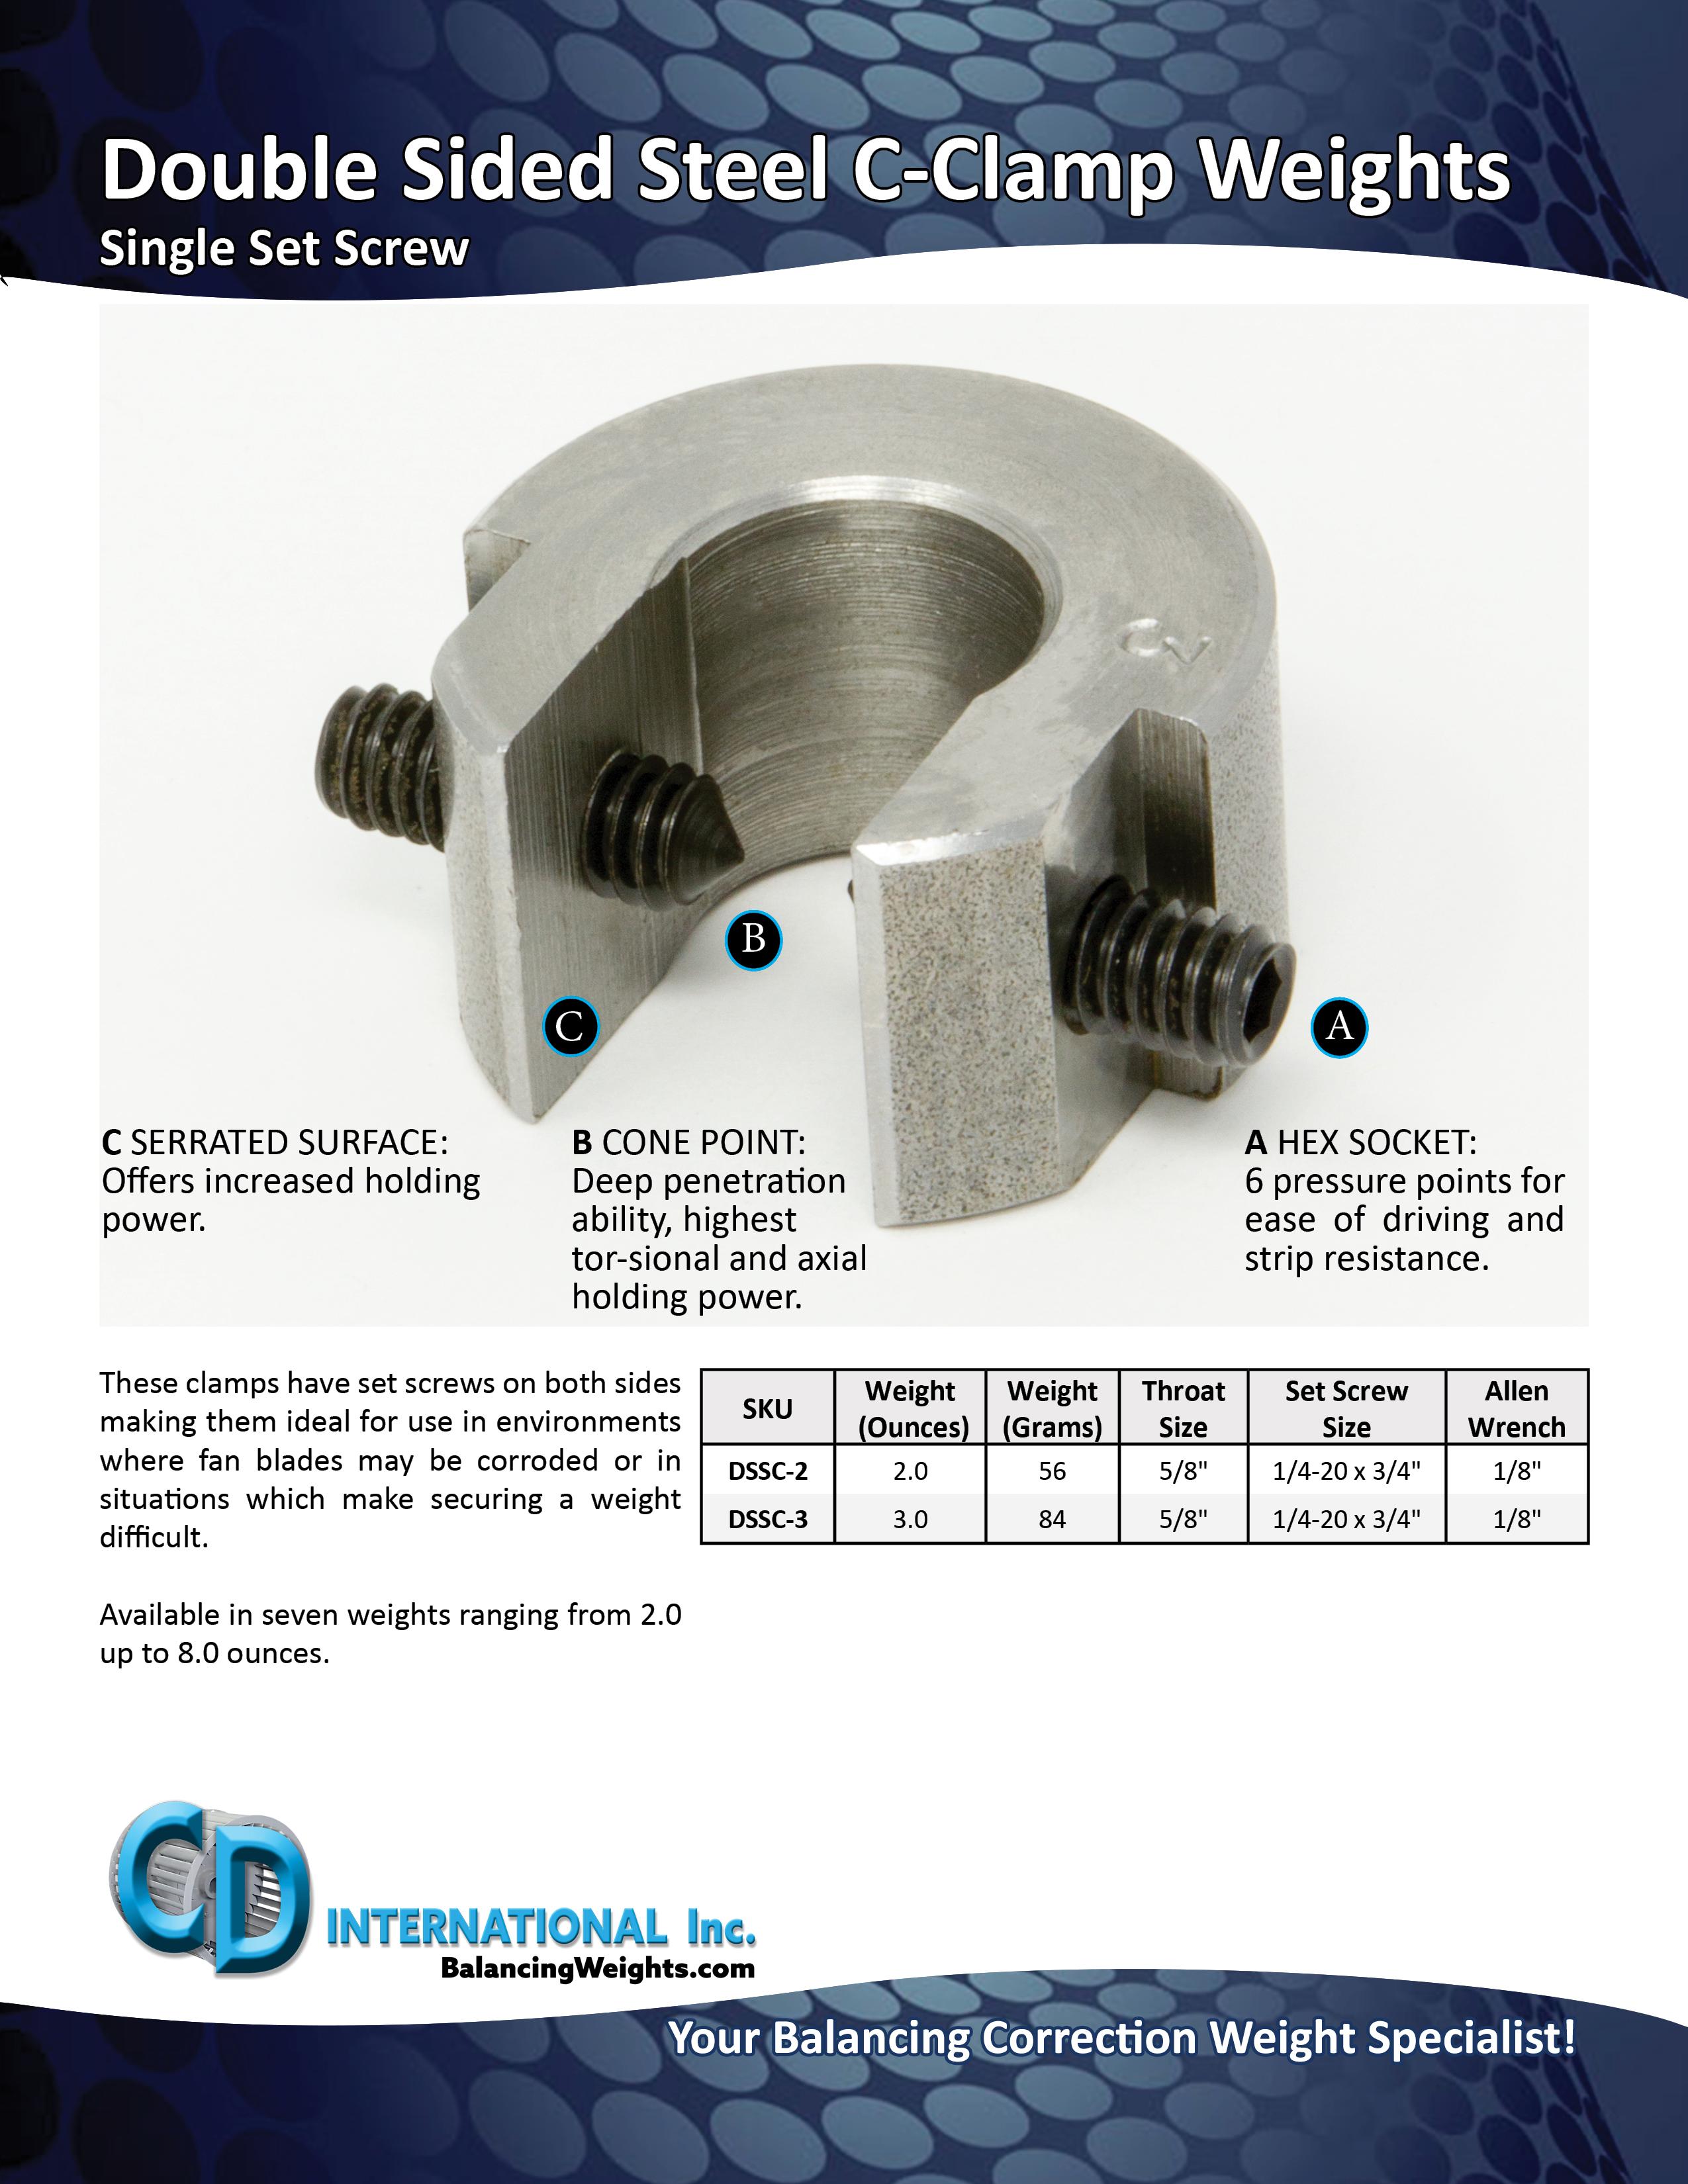 dssc-single-screw-c-clamp-spec-sheets.jpg